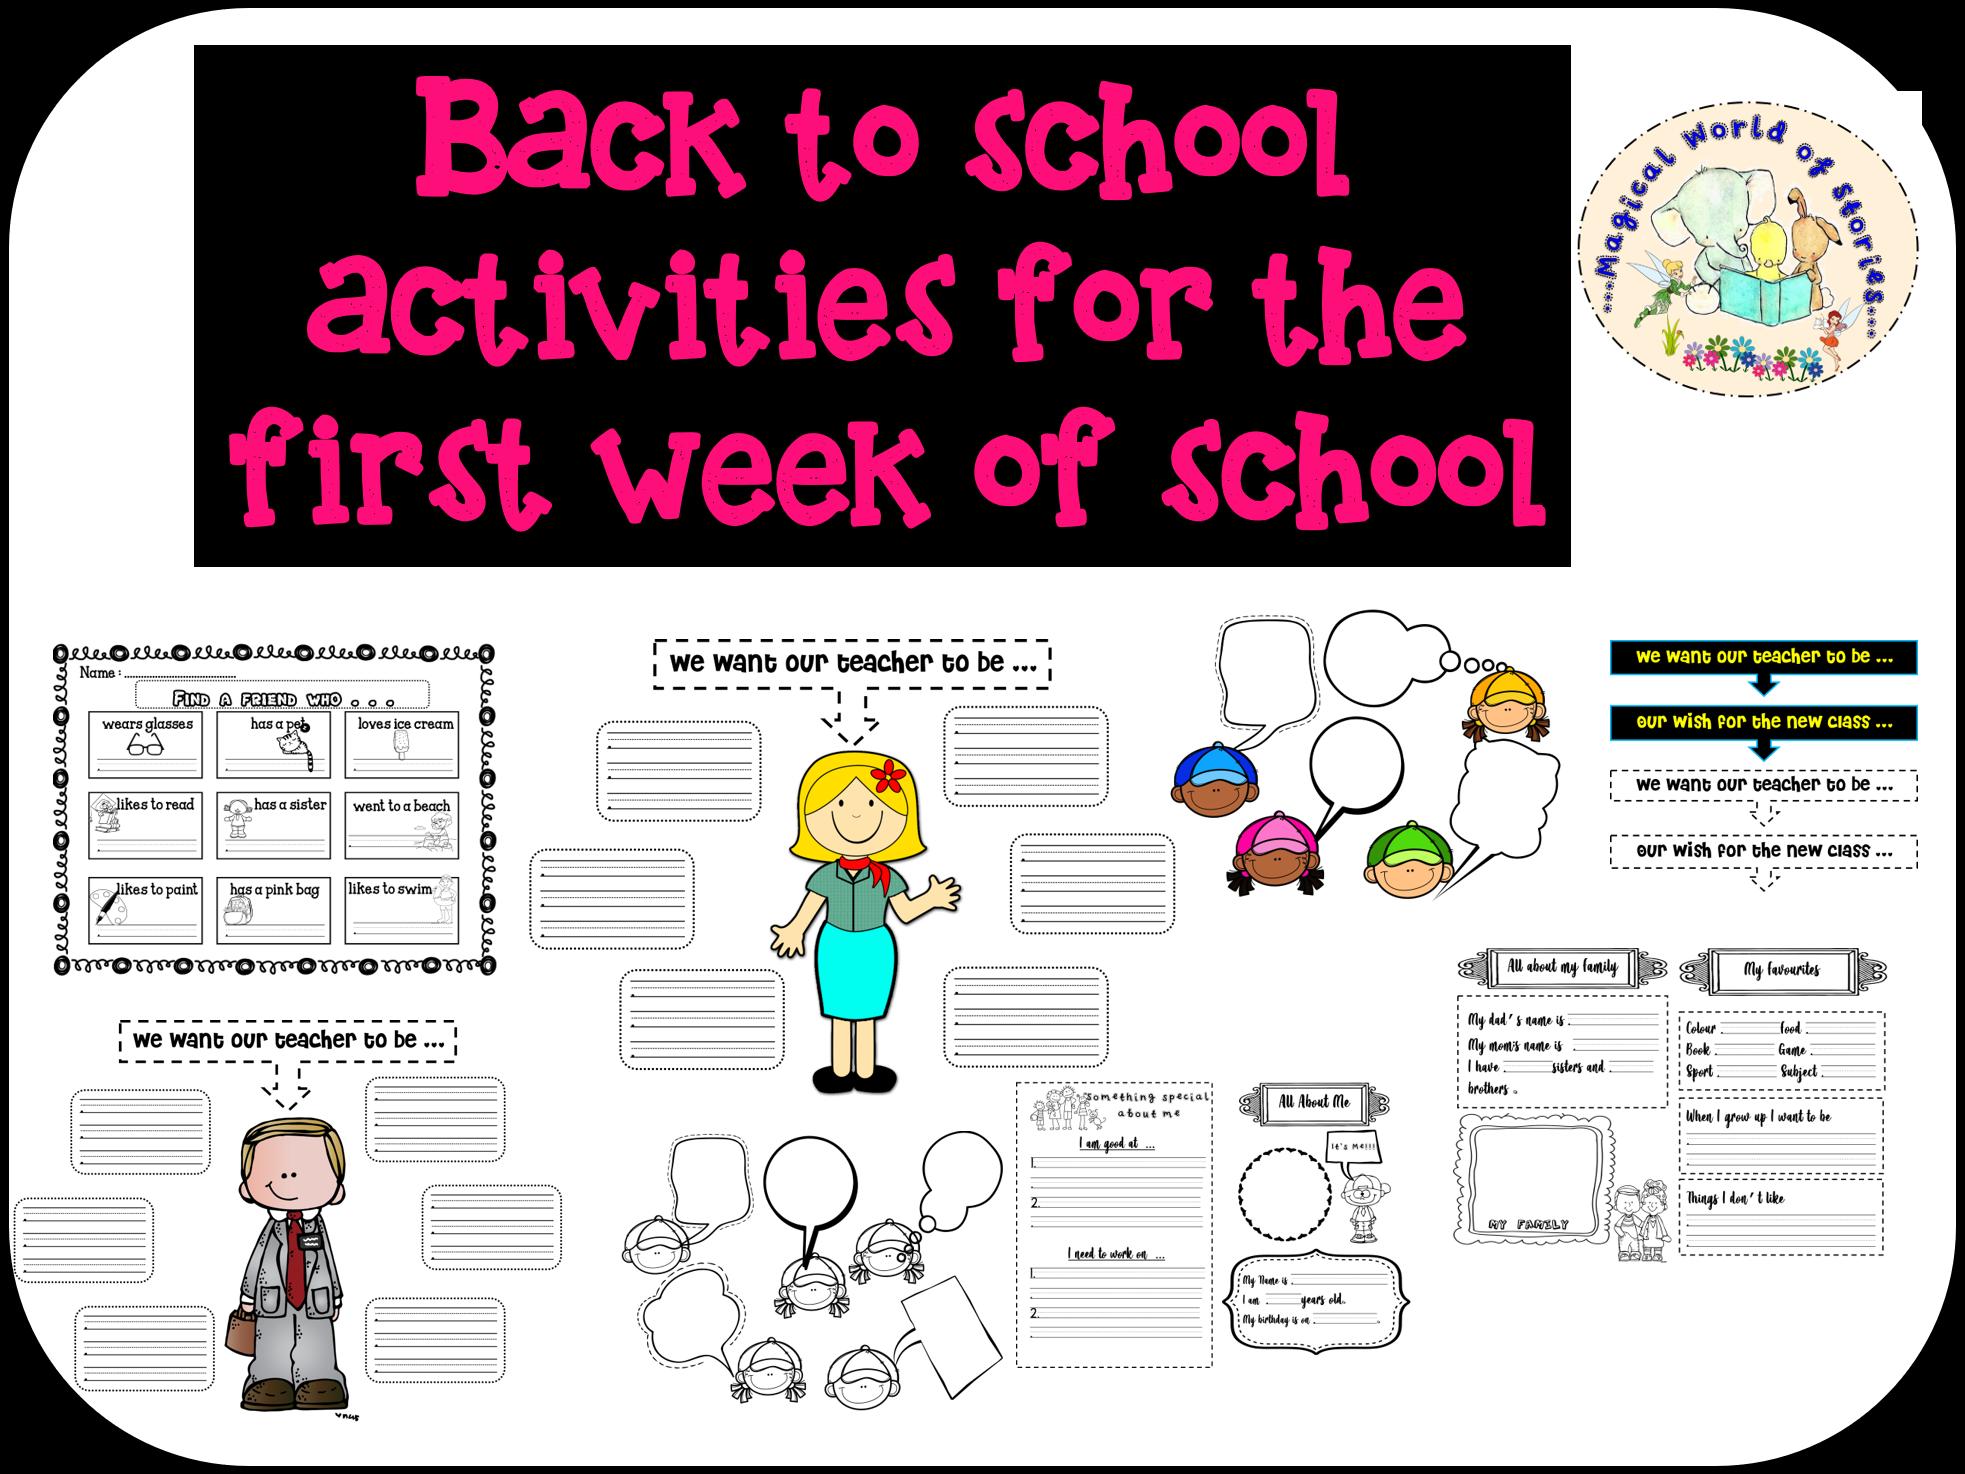 Back to School - Classroom set up & First Week activities